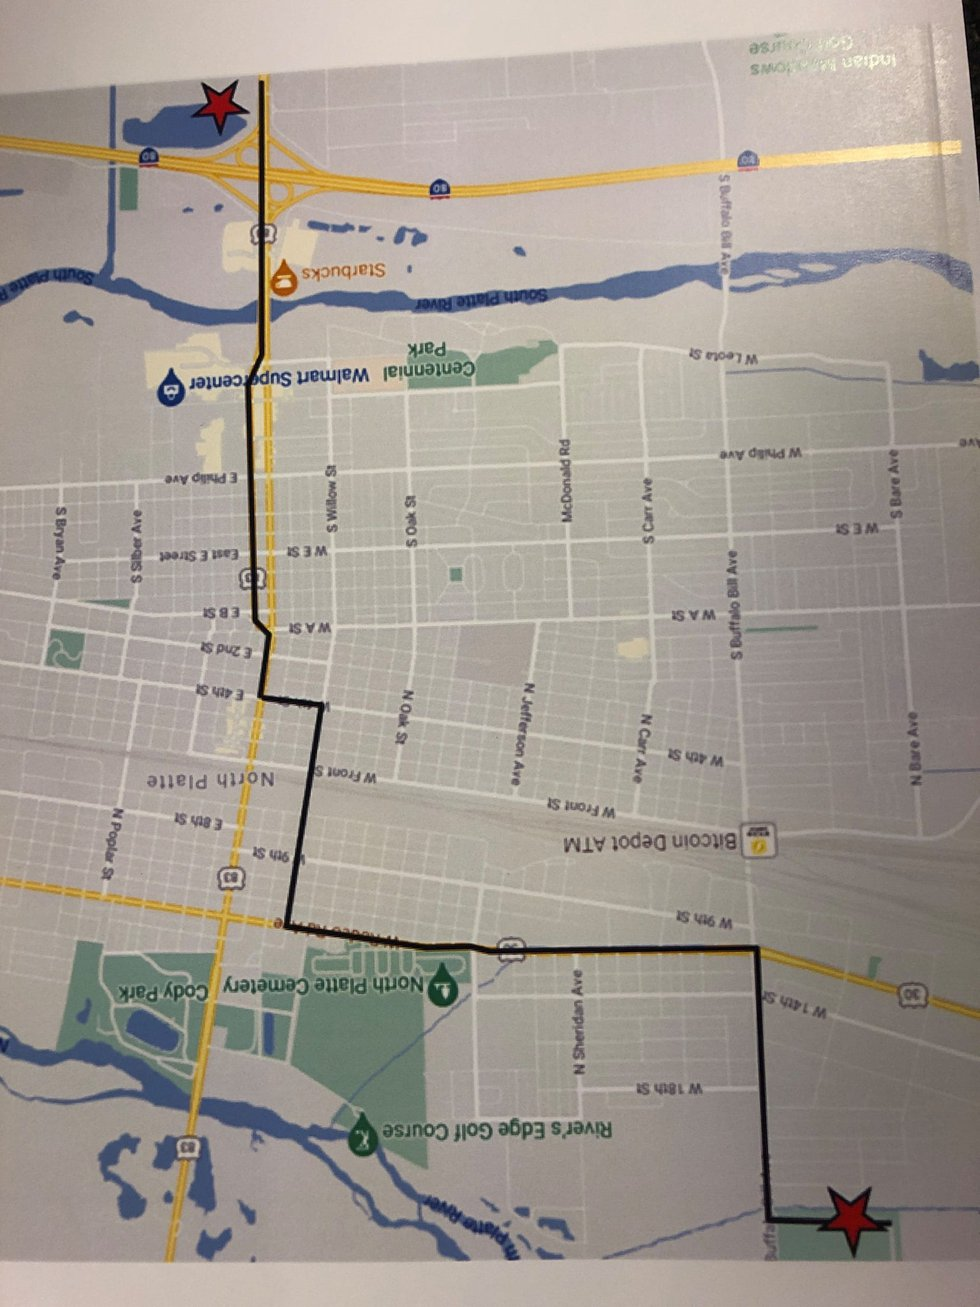 Funeral Procession Route, Saturday